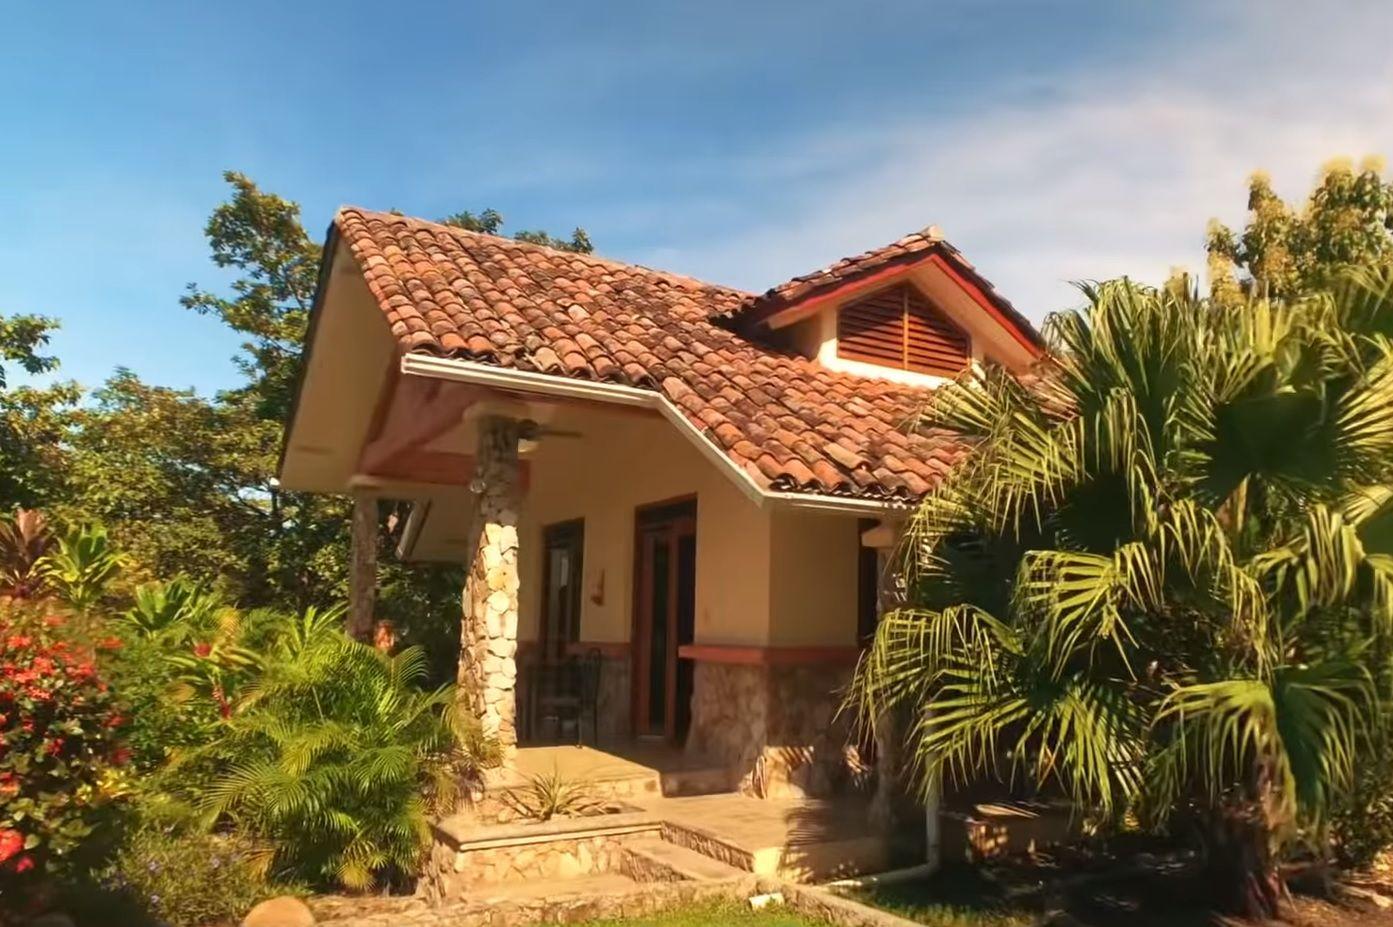 Main Photo: Ocean and beach front House in Costa Esmeralda